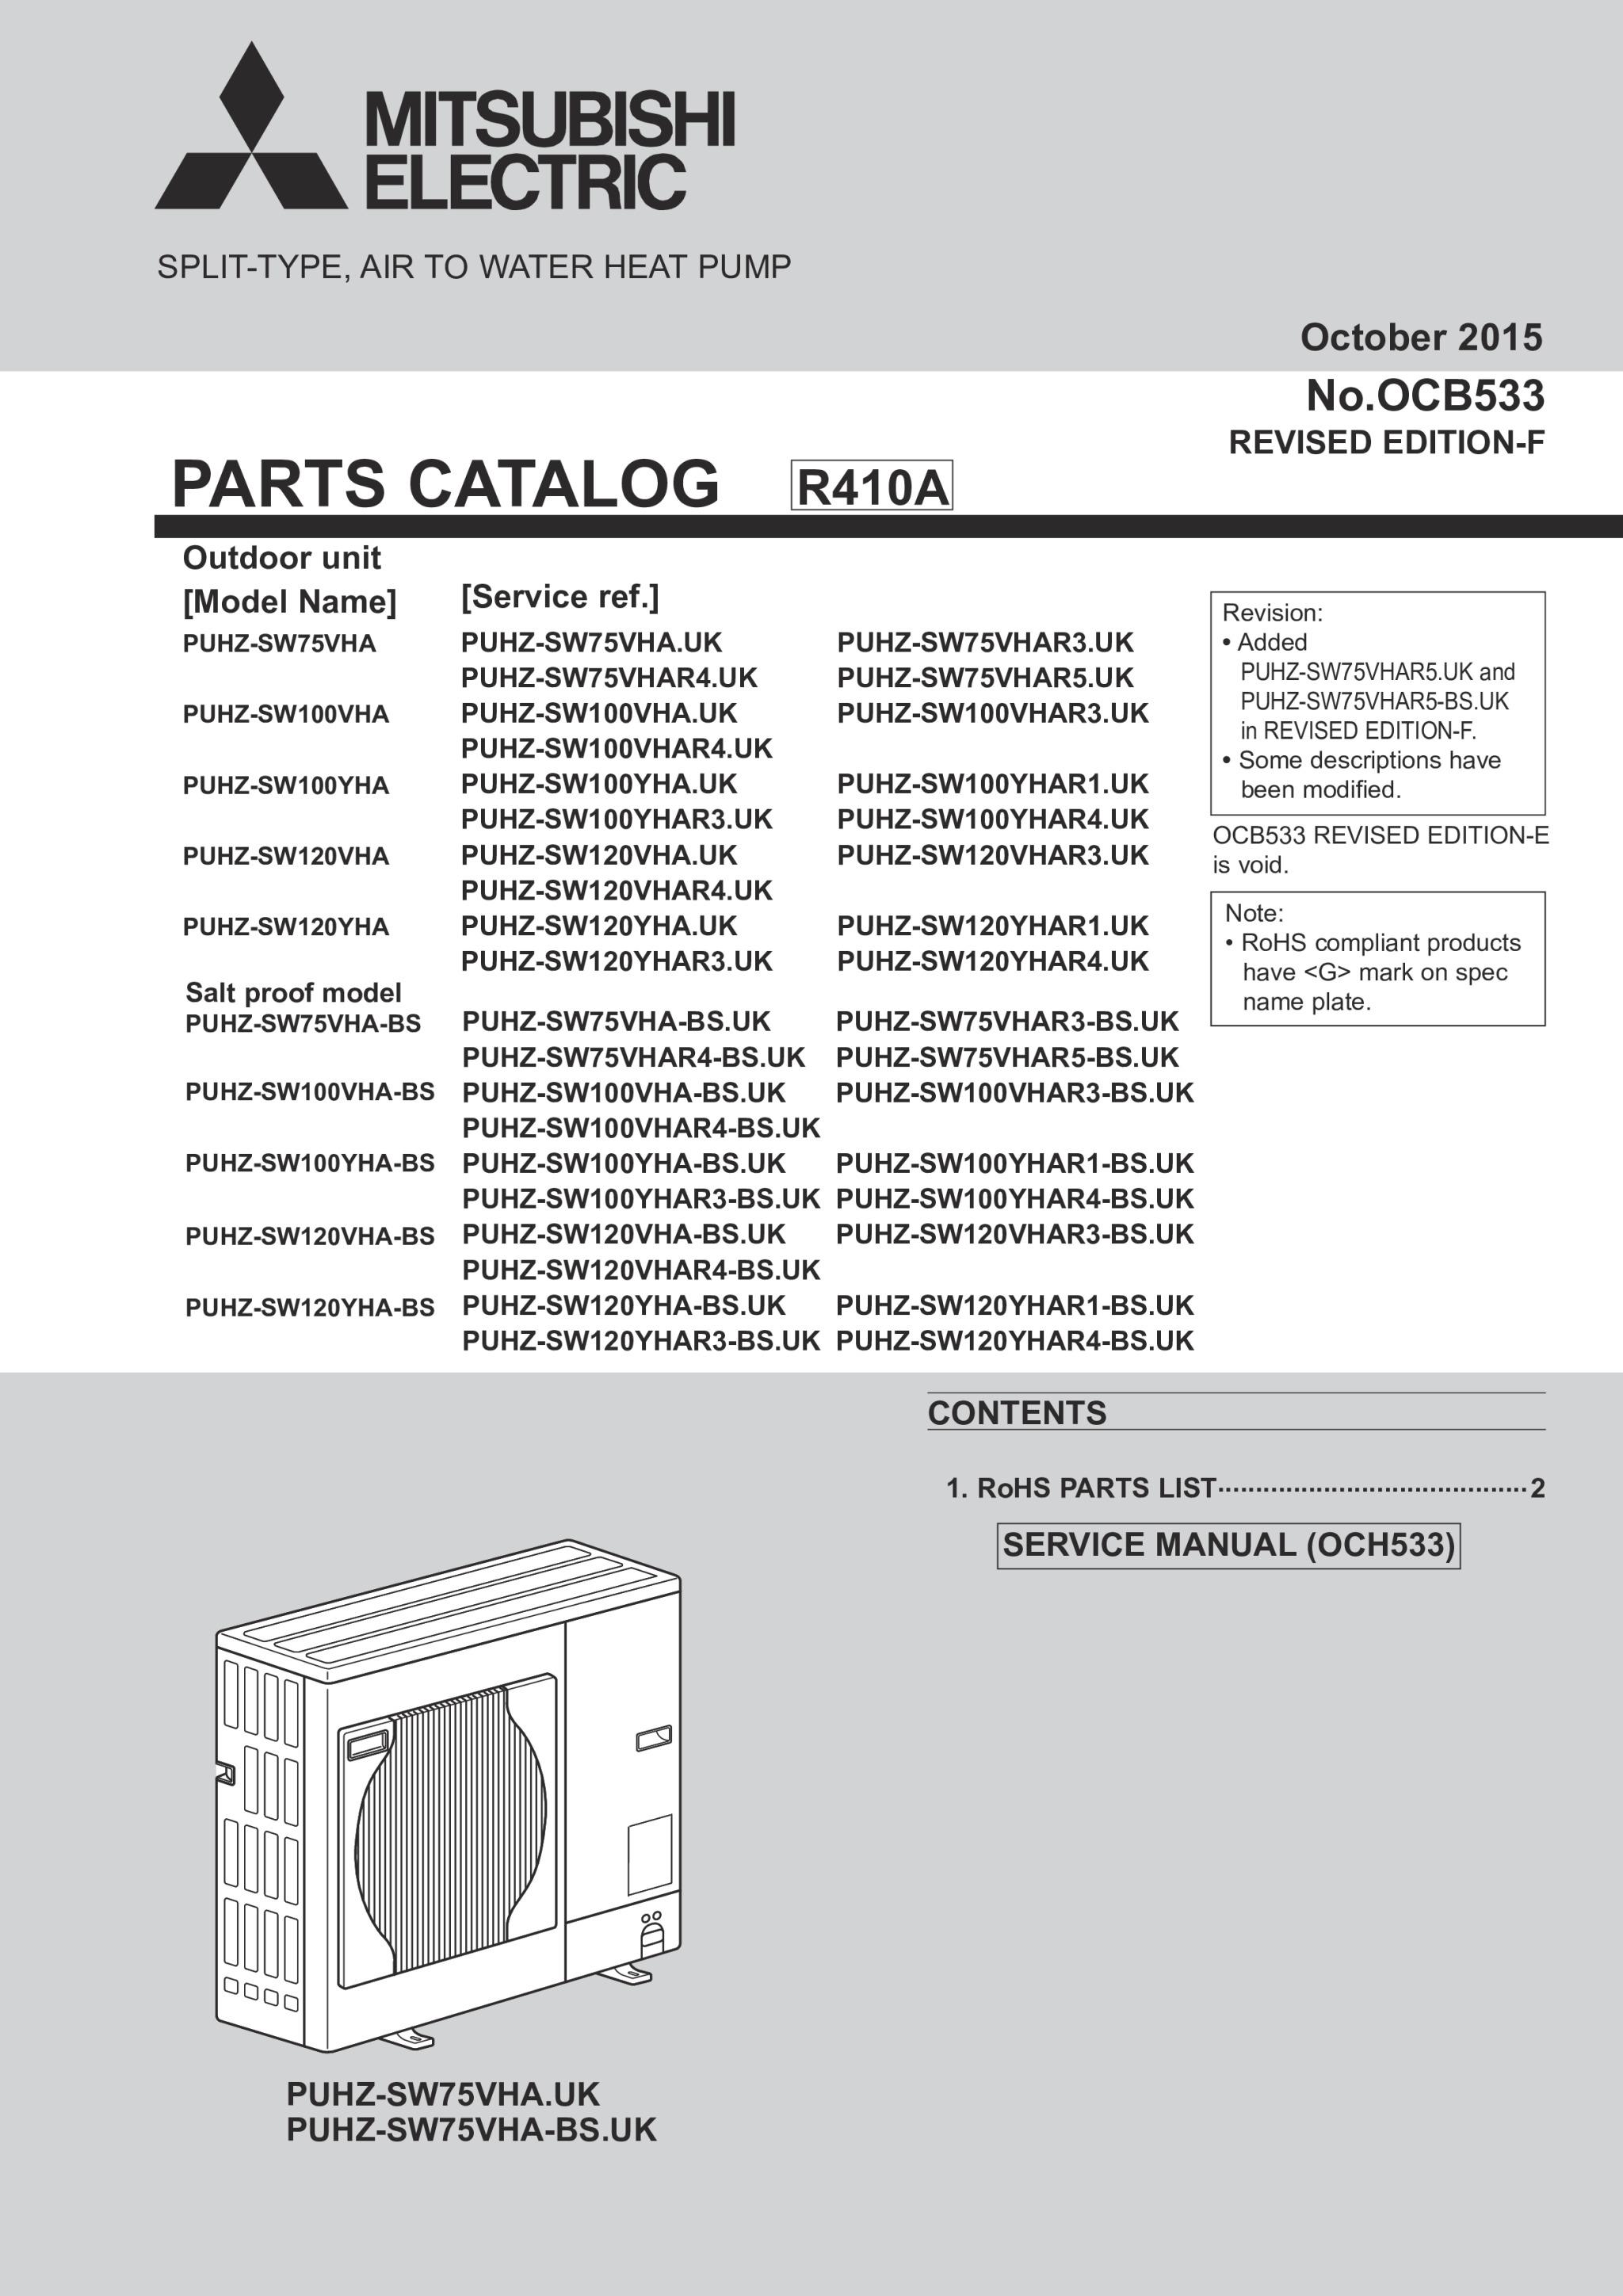 evo exterior cars car parts of mitsubishi catalog lancer diagram pinterest